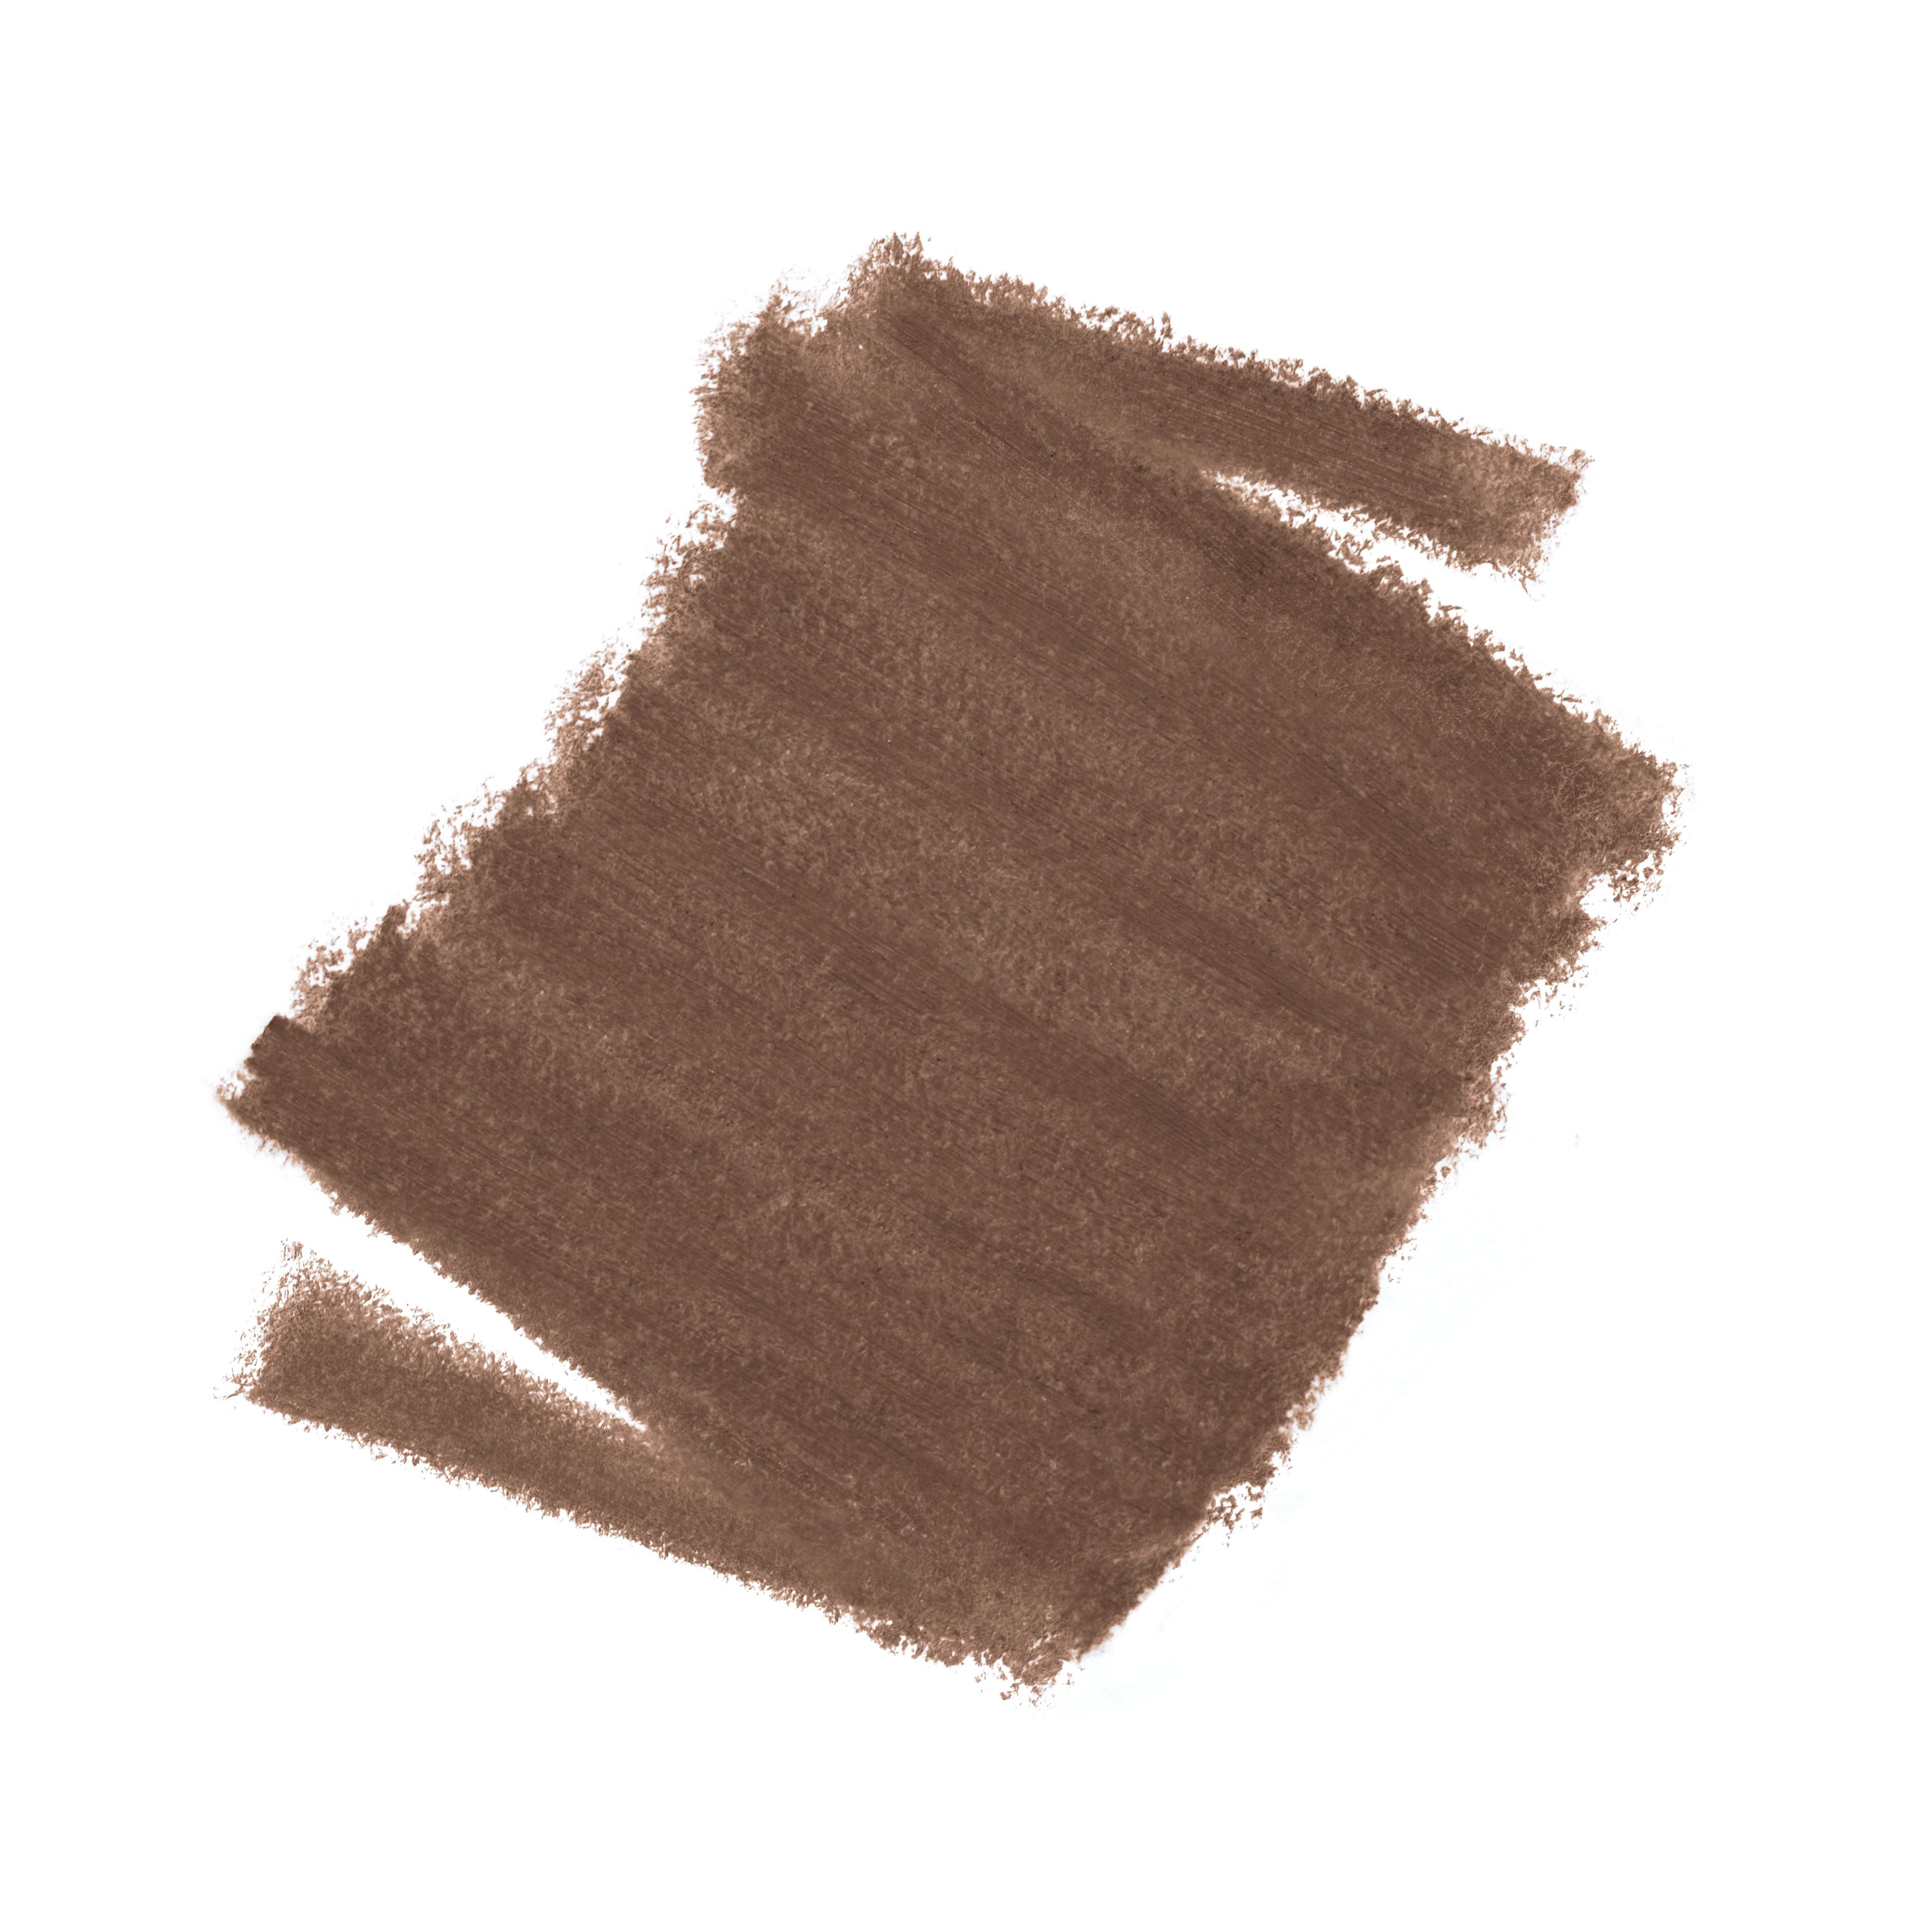 STYLO SOURCILS WATERPROOF - makeup - 0.009OZ. - Basic texture view